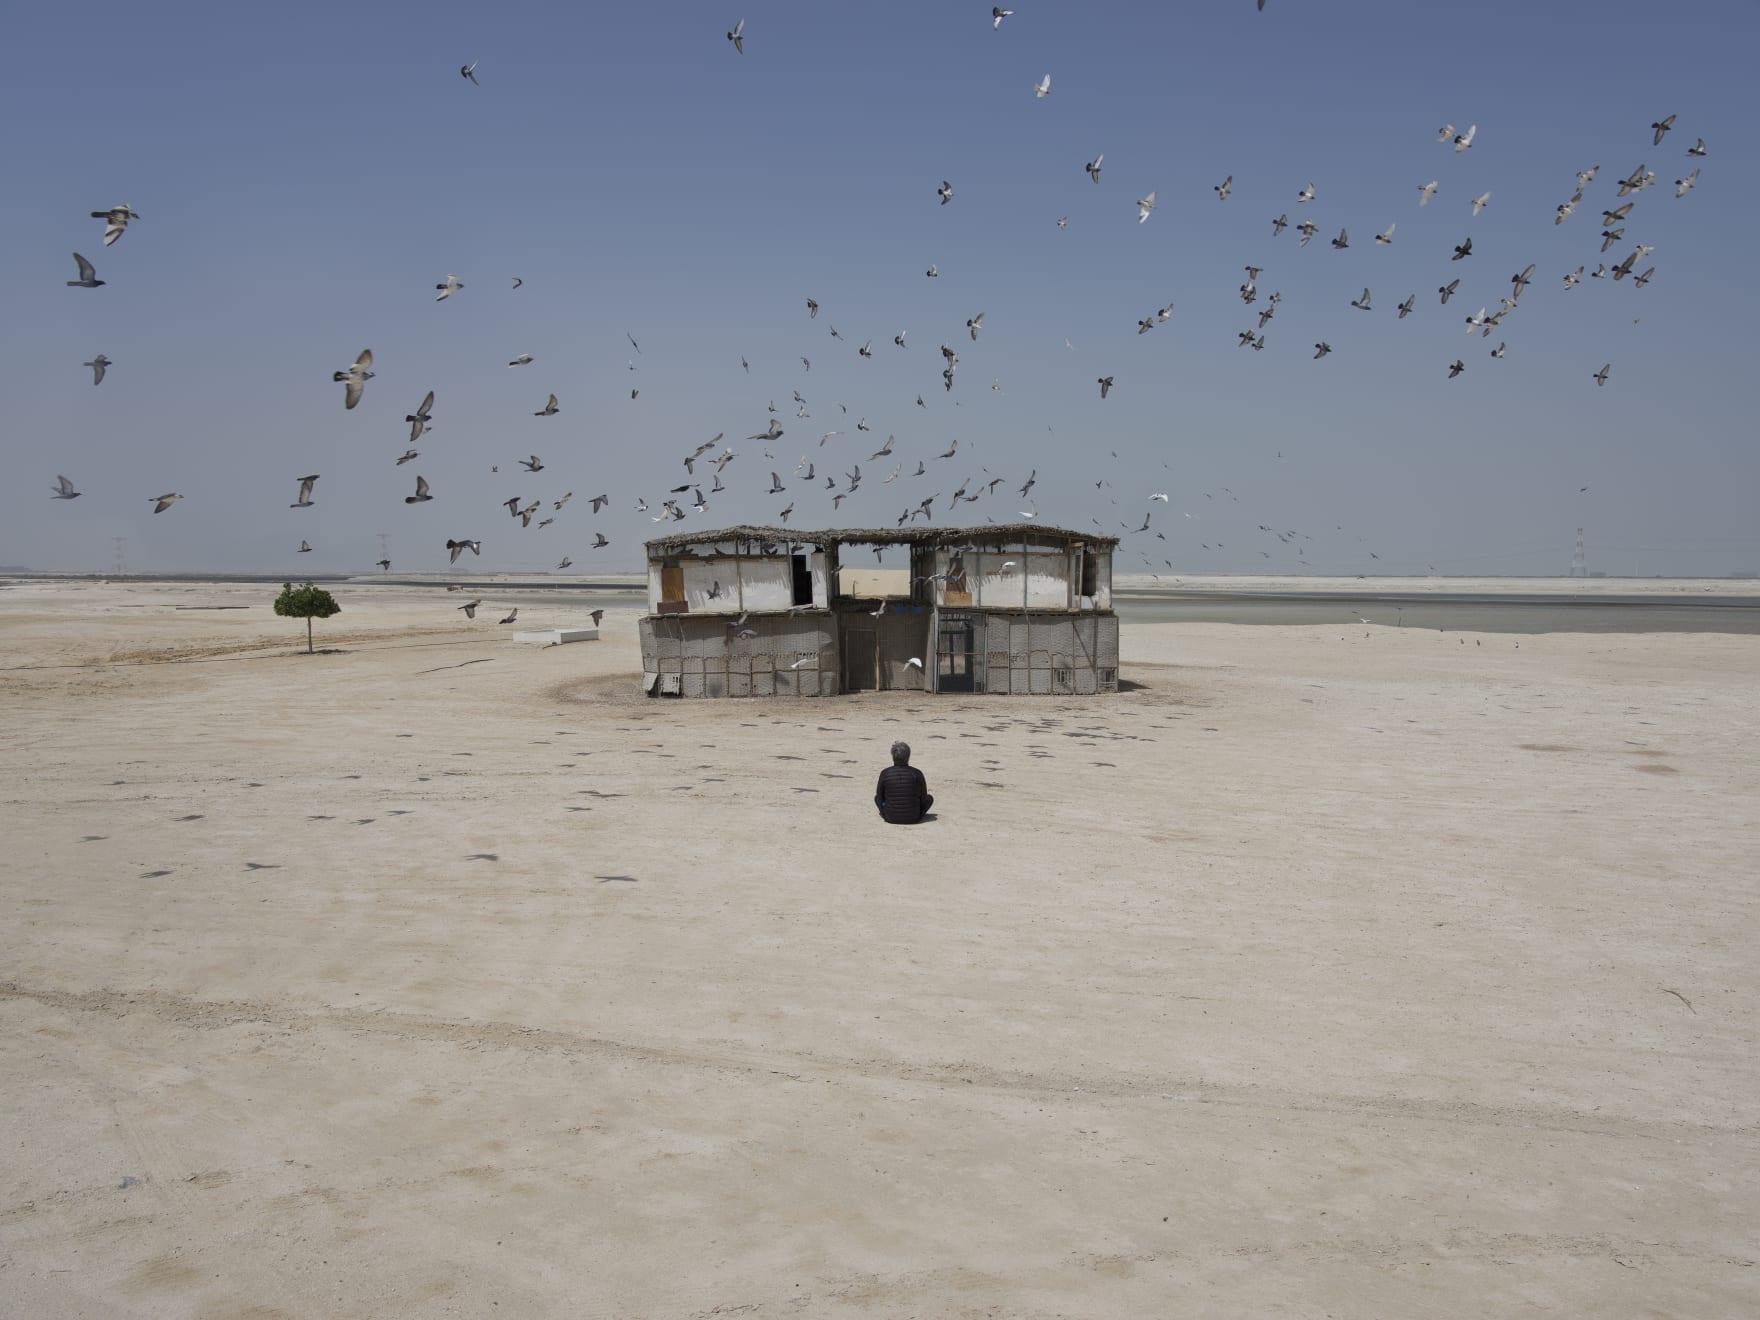 Tarek Al-Ghoussein, Abu Dhabi Archipelago (Jubabibat), 2015-, Digital Print, 60 x 80 cm, Edition of 6 + 1AP USD 8,000 (Excluding VAT)